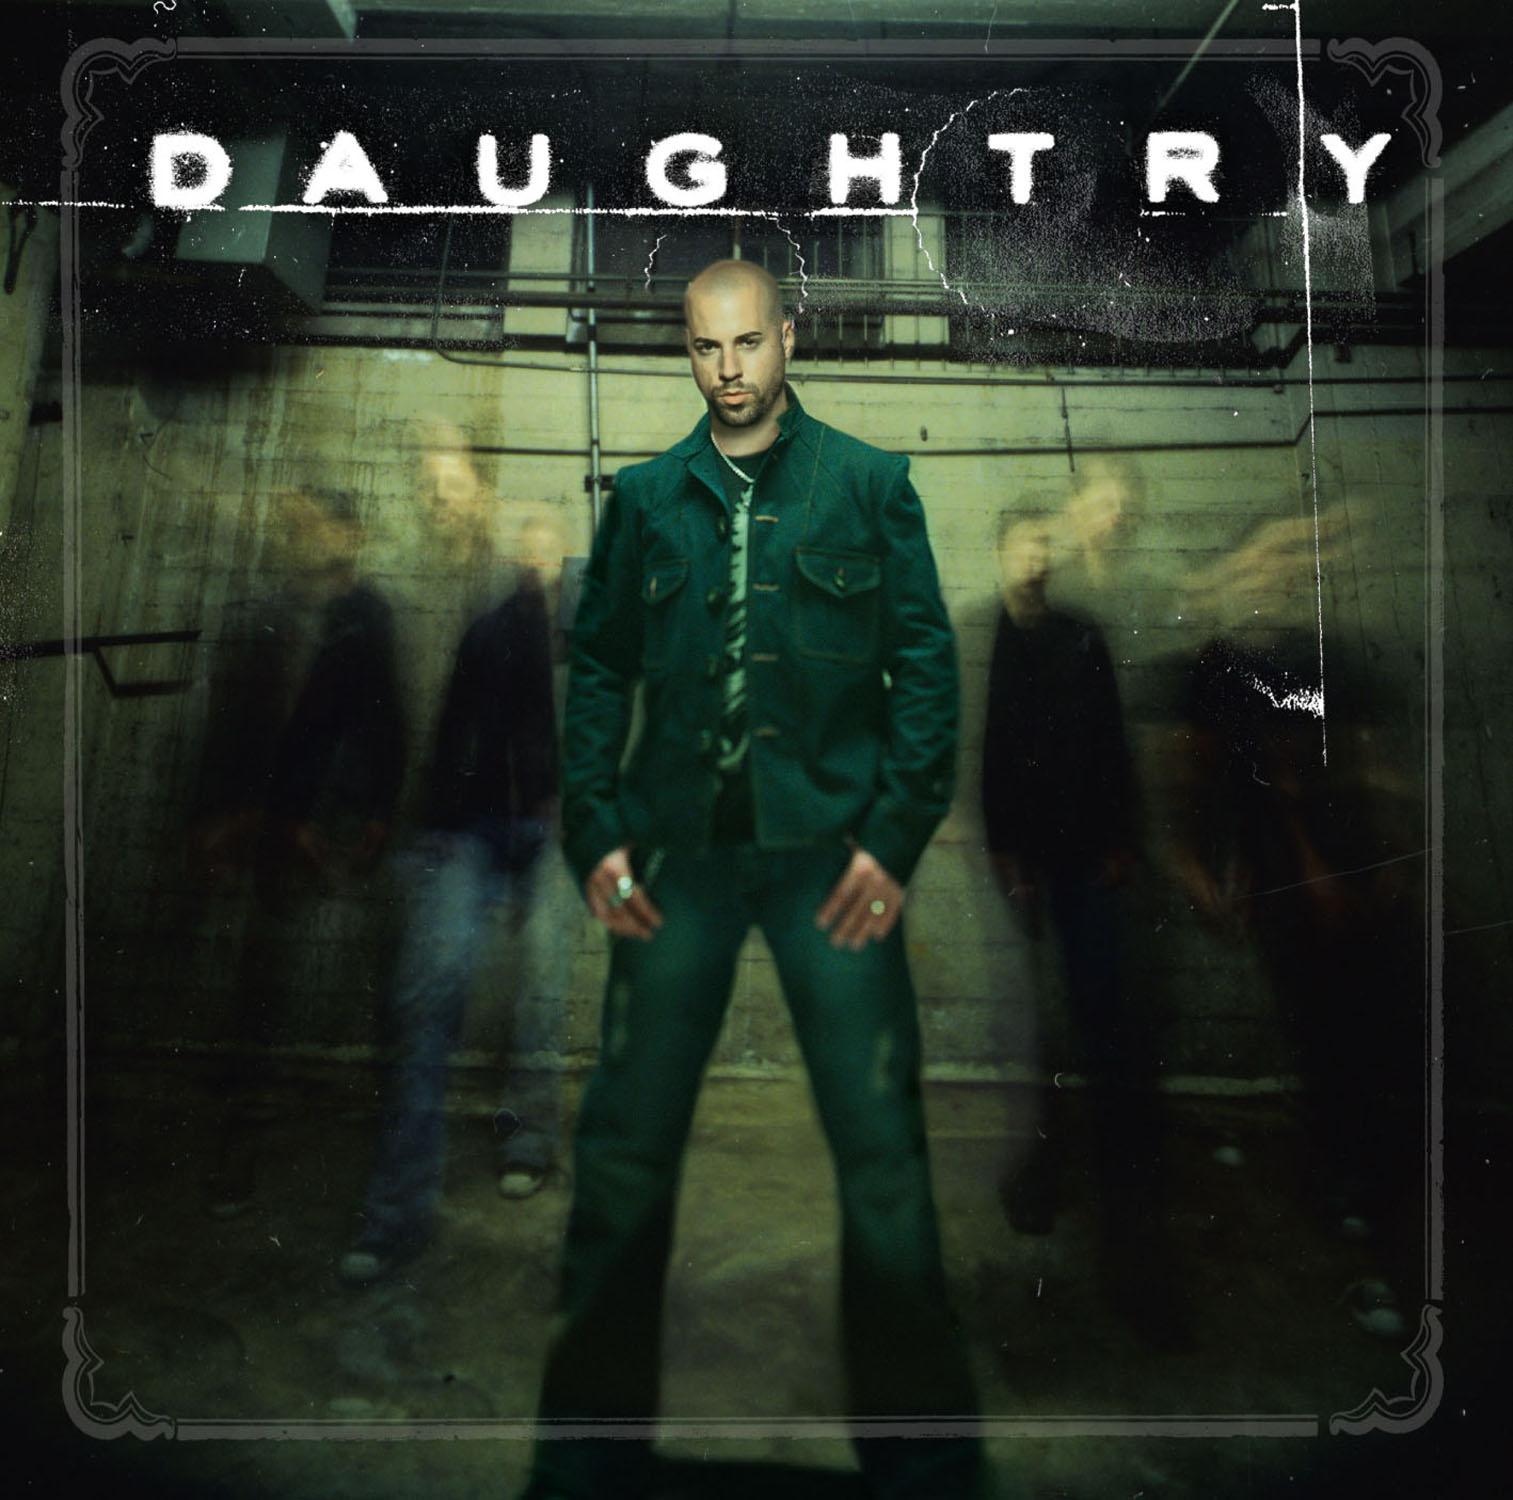 http://4.bp.blogspot.com/-L5S43hgYWgs/Tf1orRdSBbI/AAAAAAAAADg/gh-f0CxdomM/s1600/Daughtry-CD-Cover--RCA-778213.jpg